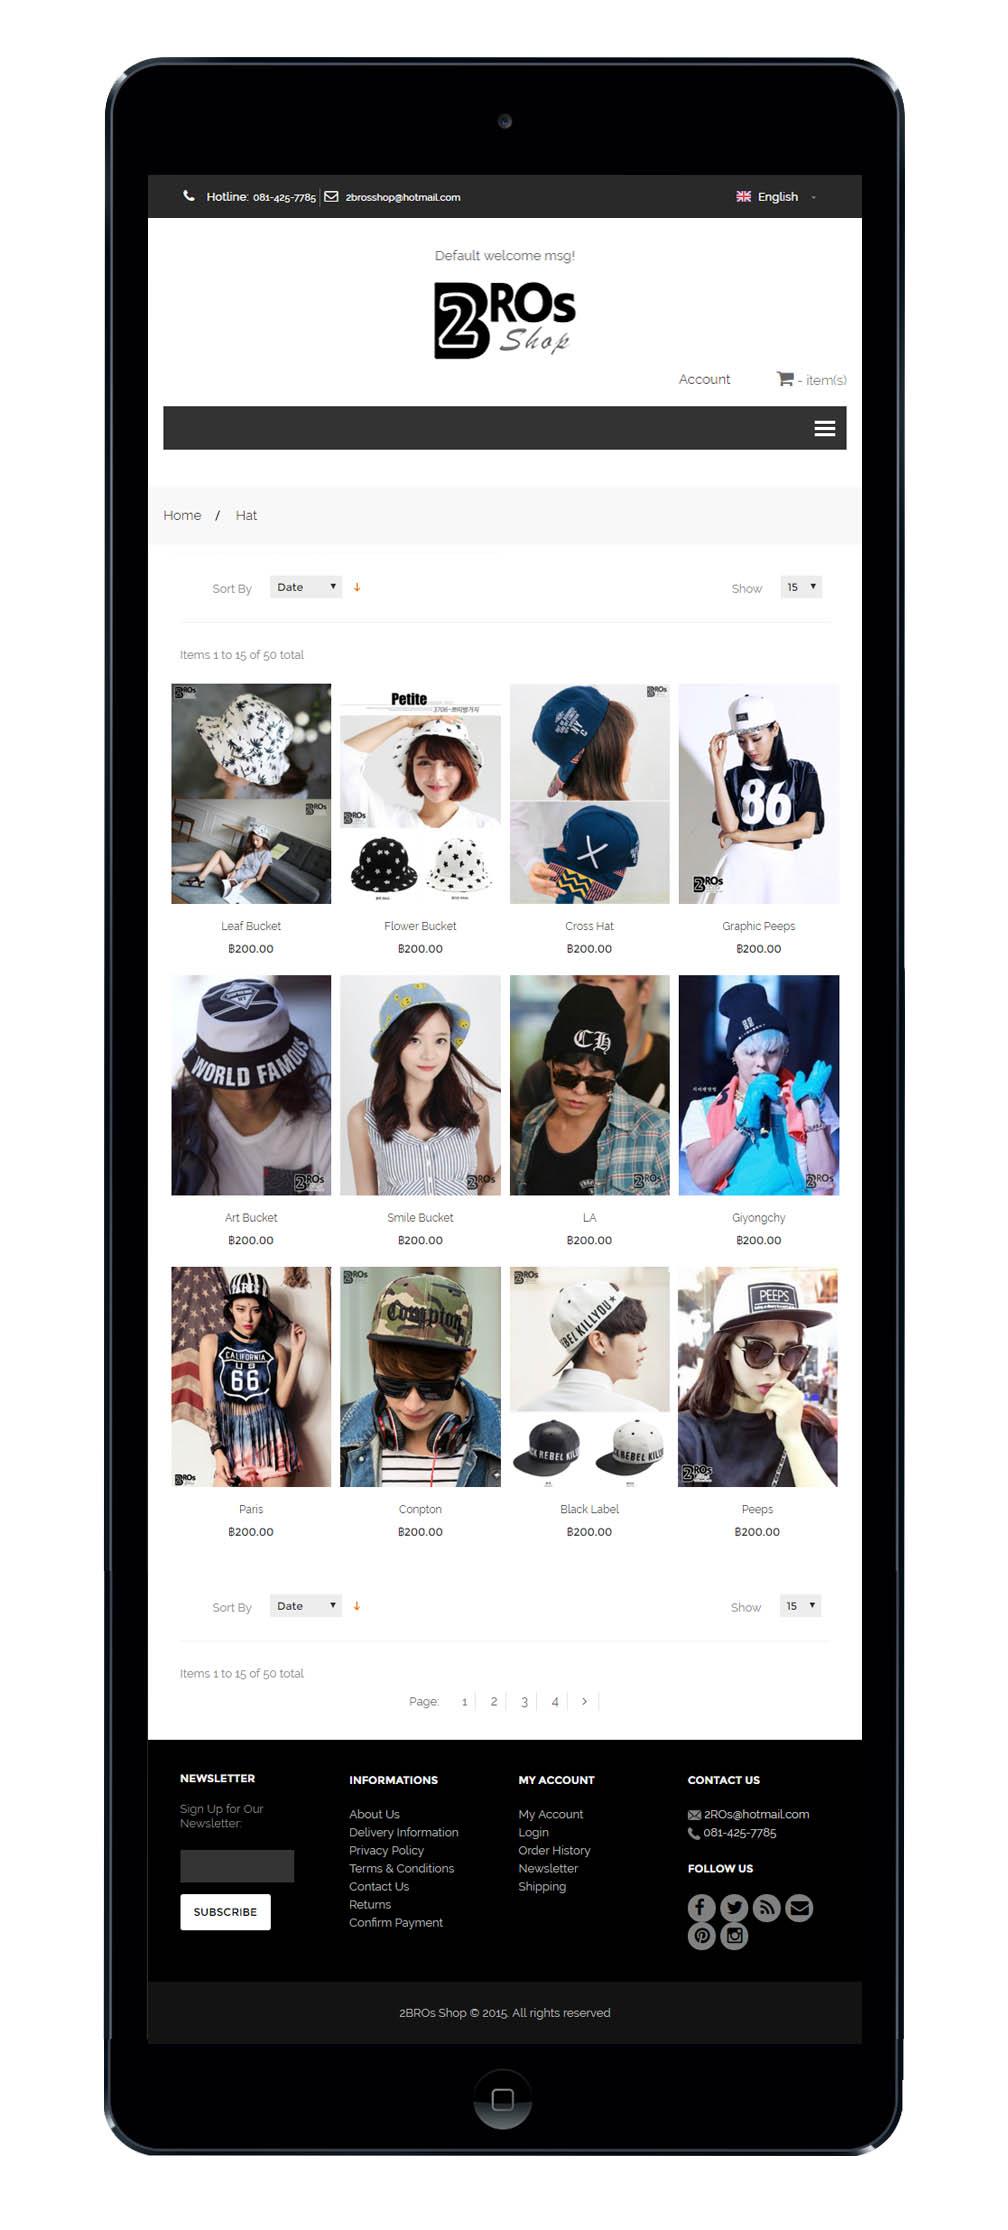 2brosshop_iPad